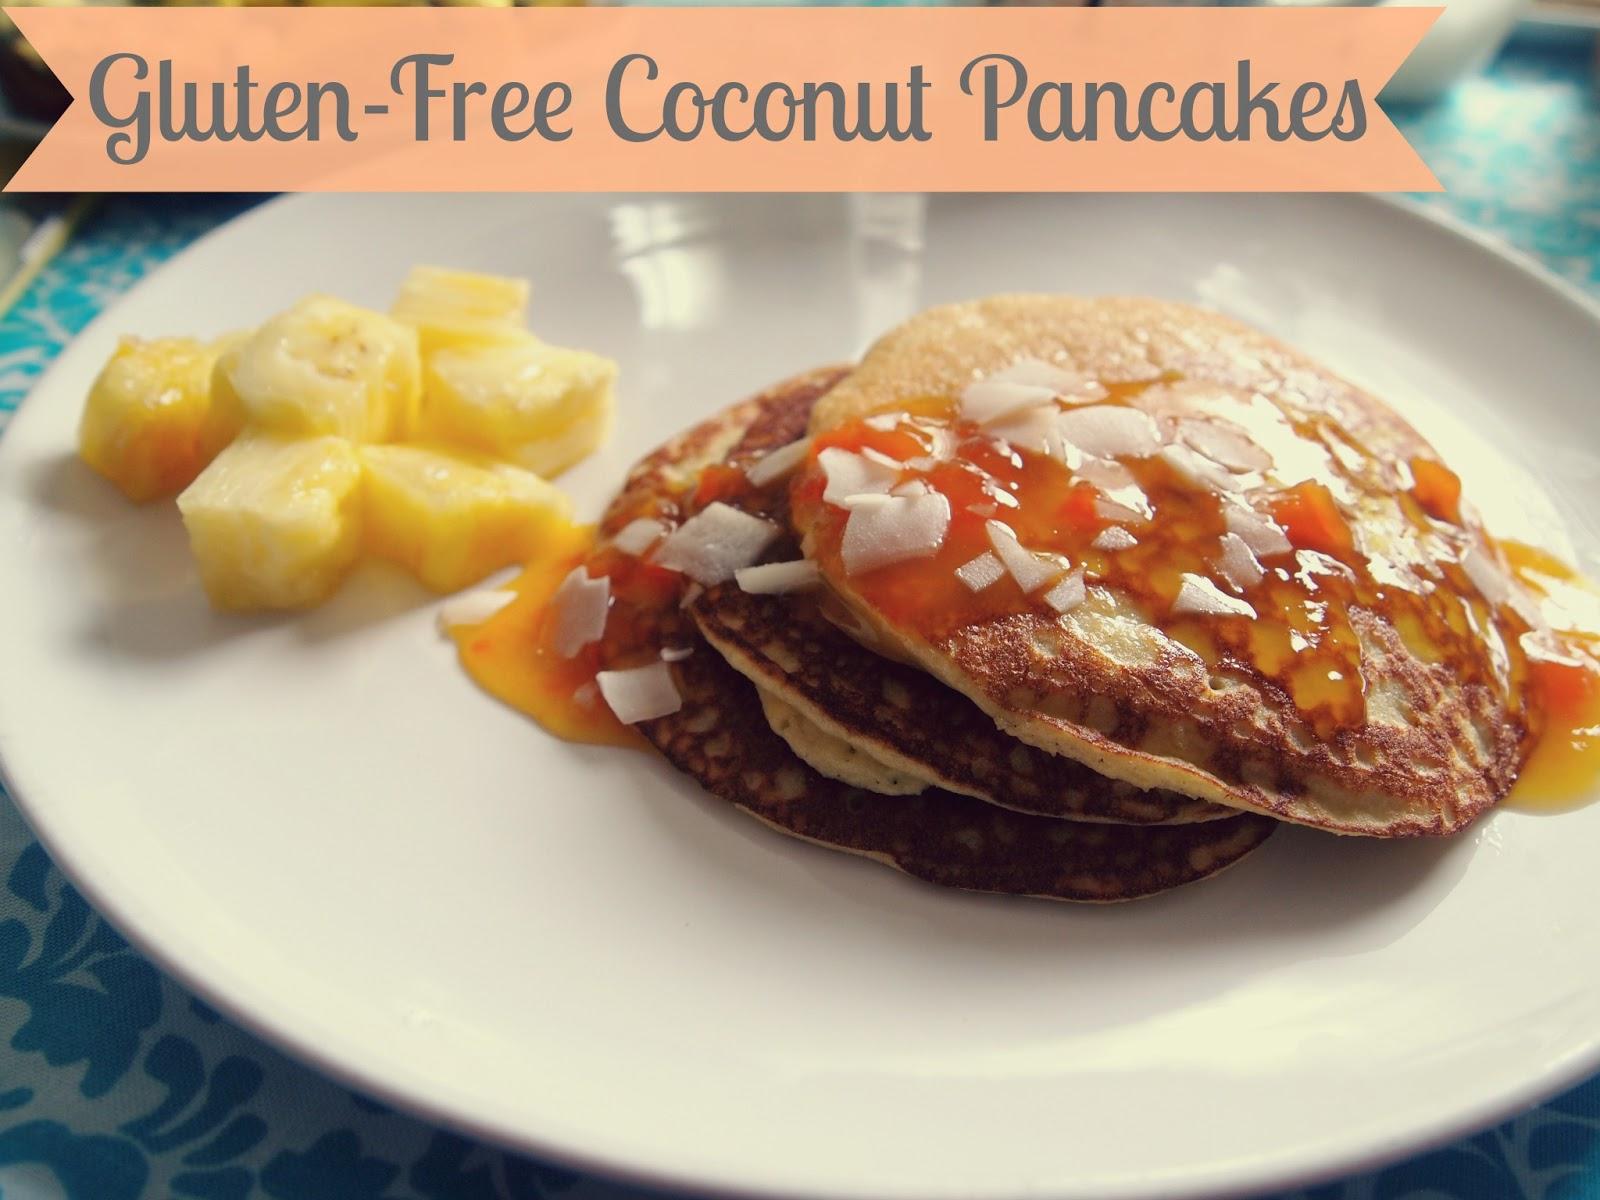 ... Lovely Gluten-free Brunch : Coconut Pancakes & Crustless Mini Quiche